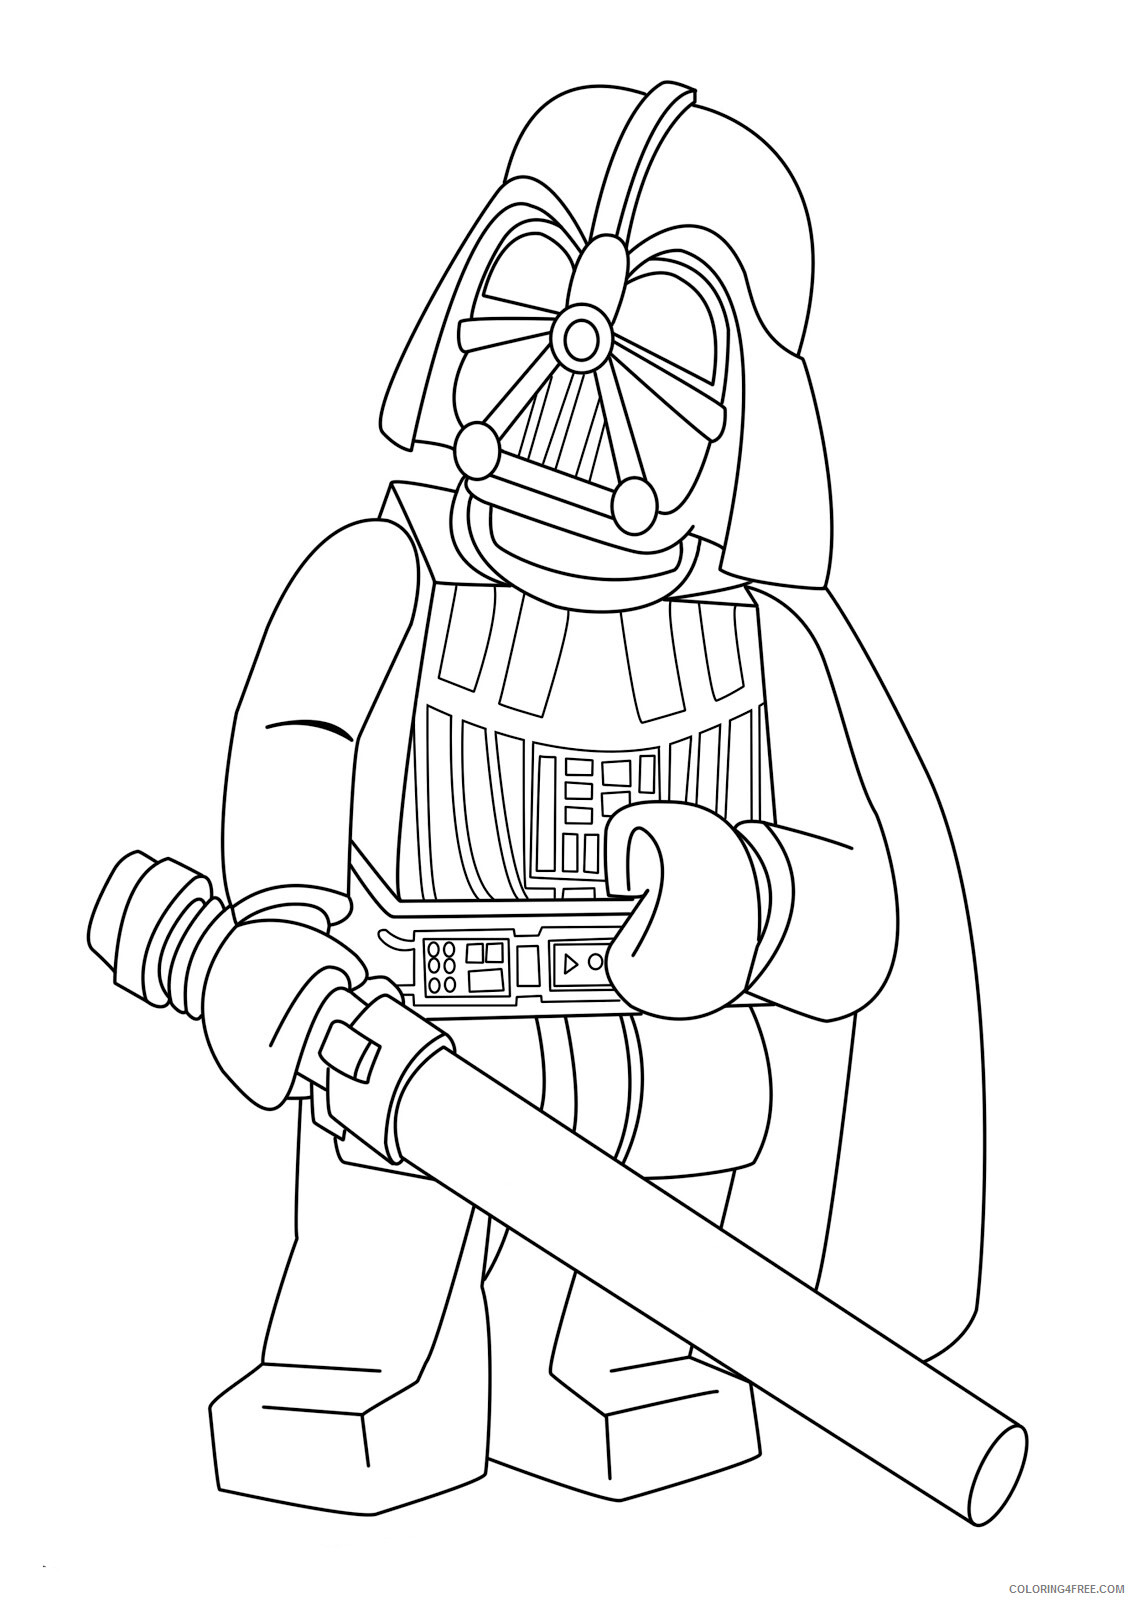 Star Wars Coloring Pages TV Film Lego Star Wars Vader Printable 2020 07808 Coloring4free